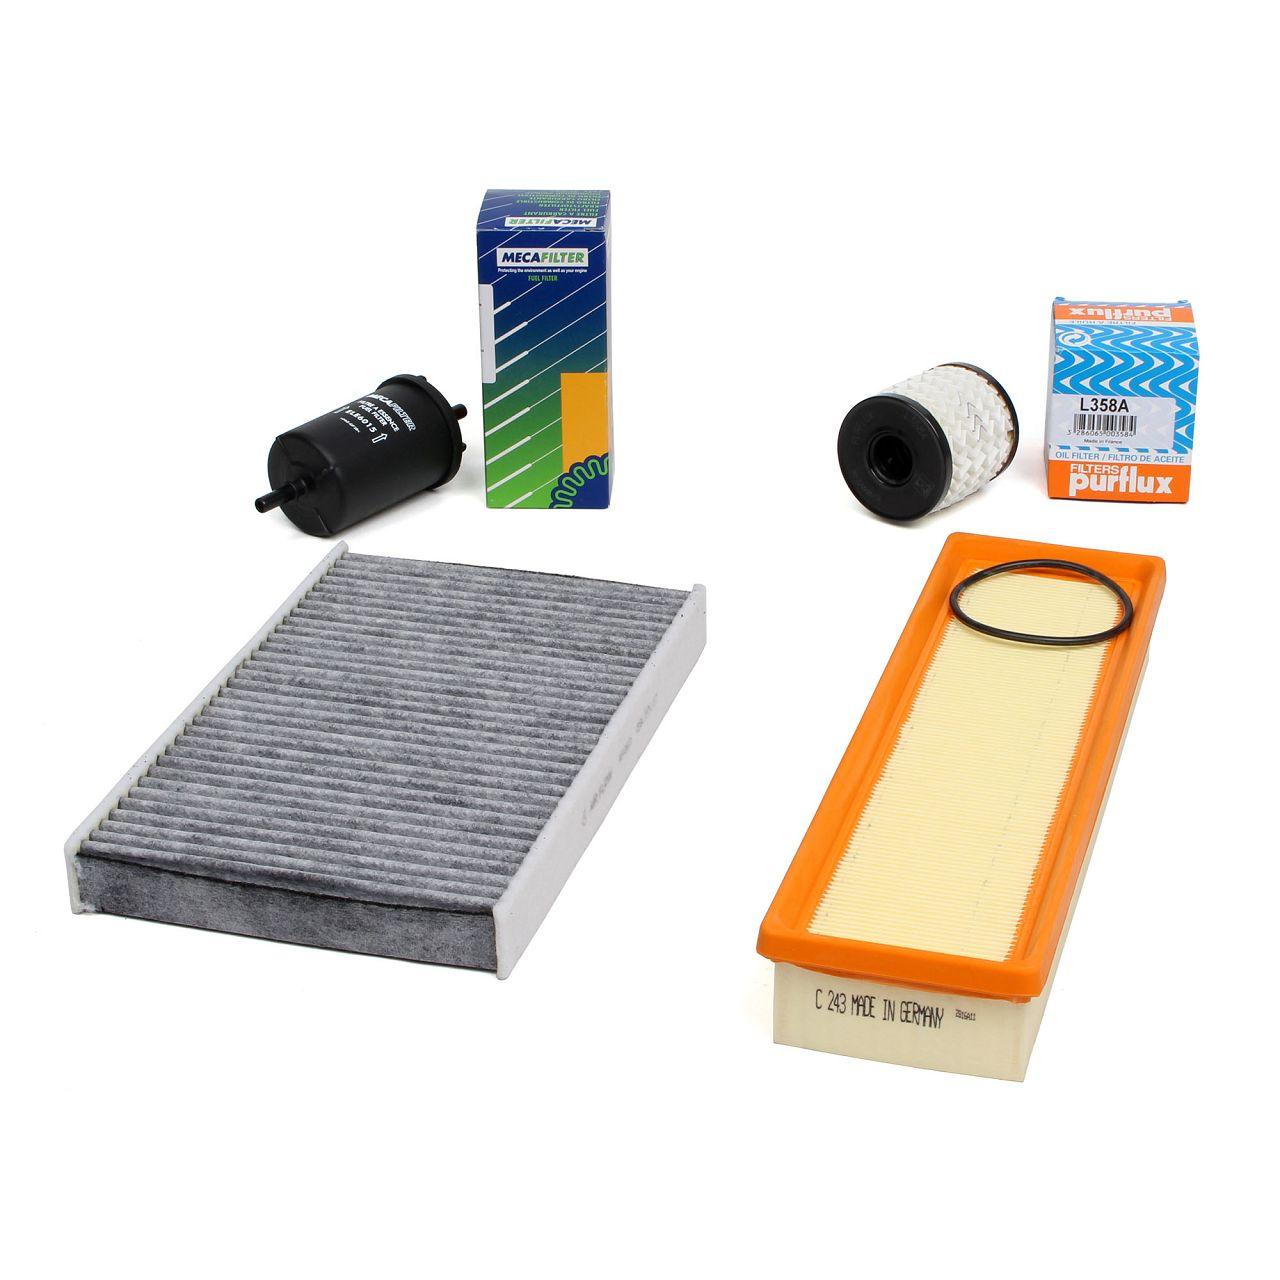 Inspektionskit Filterpaket Filterset für PEUGEOT 307 / SW / BREAK 1.4 16V 88 PS